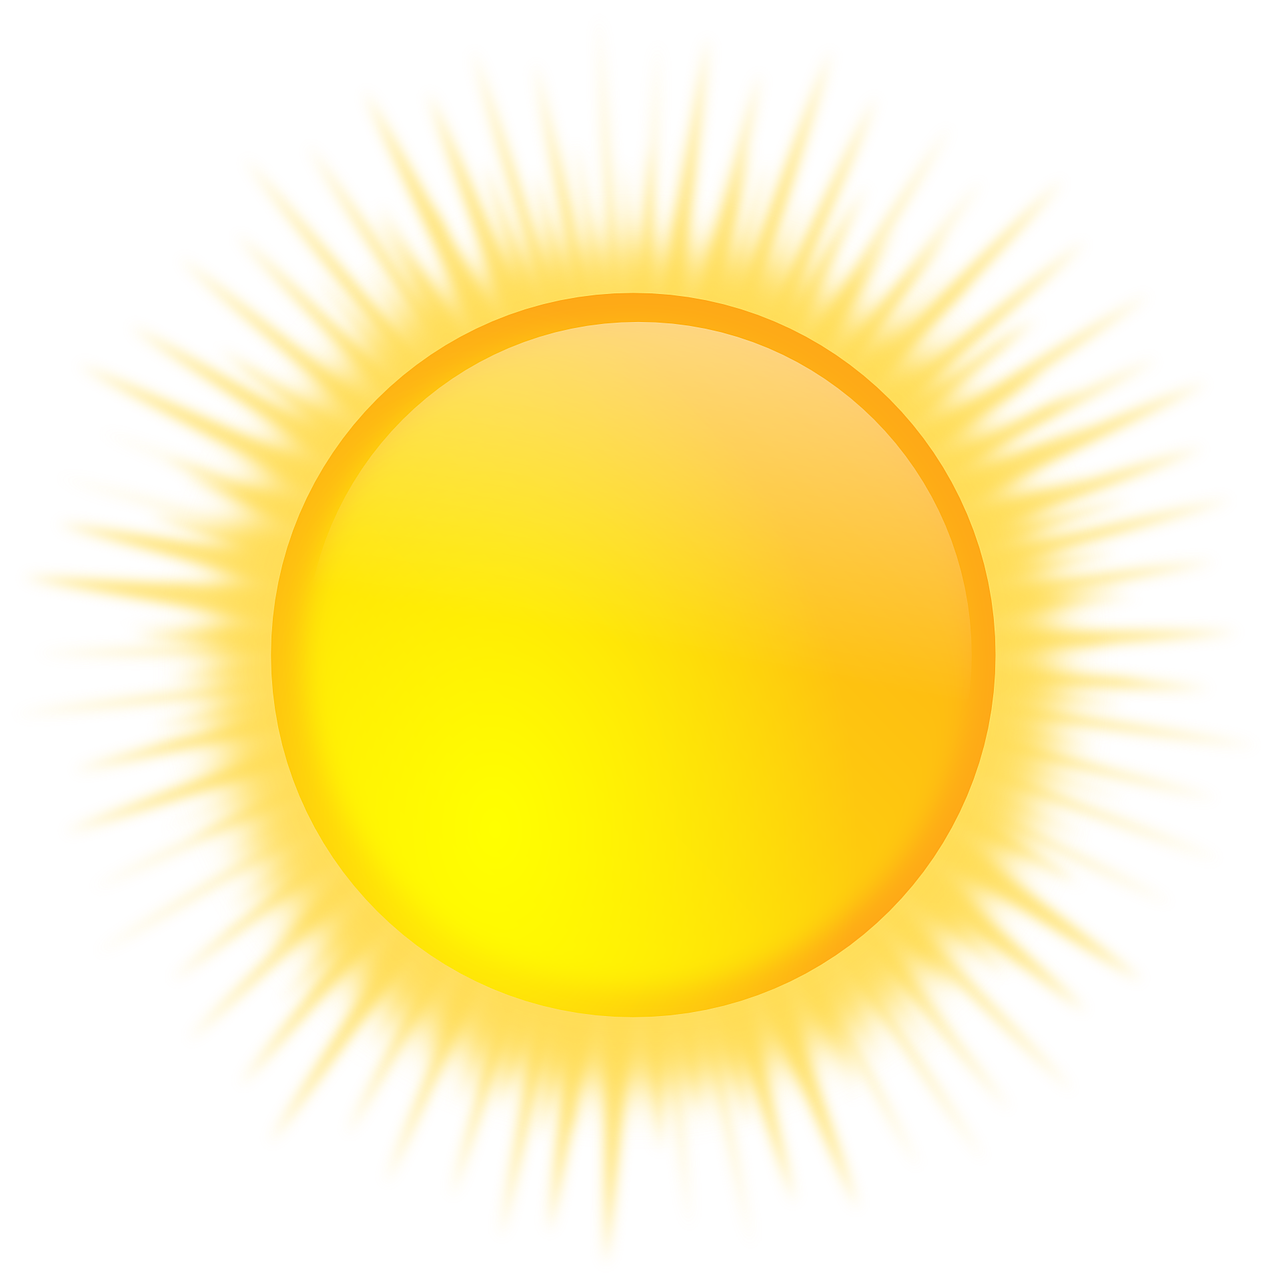 Clipart sunshine bright. Sun weather free to